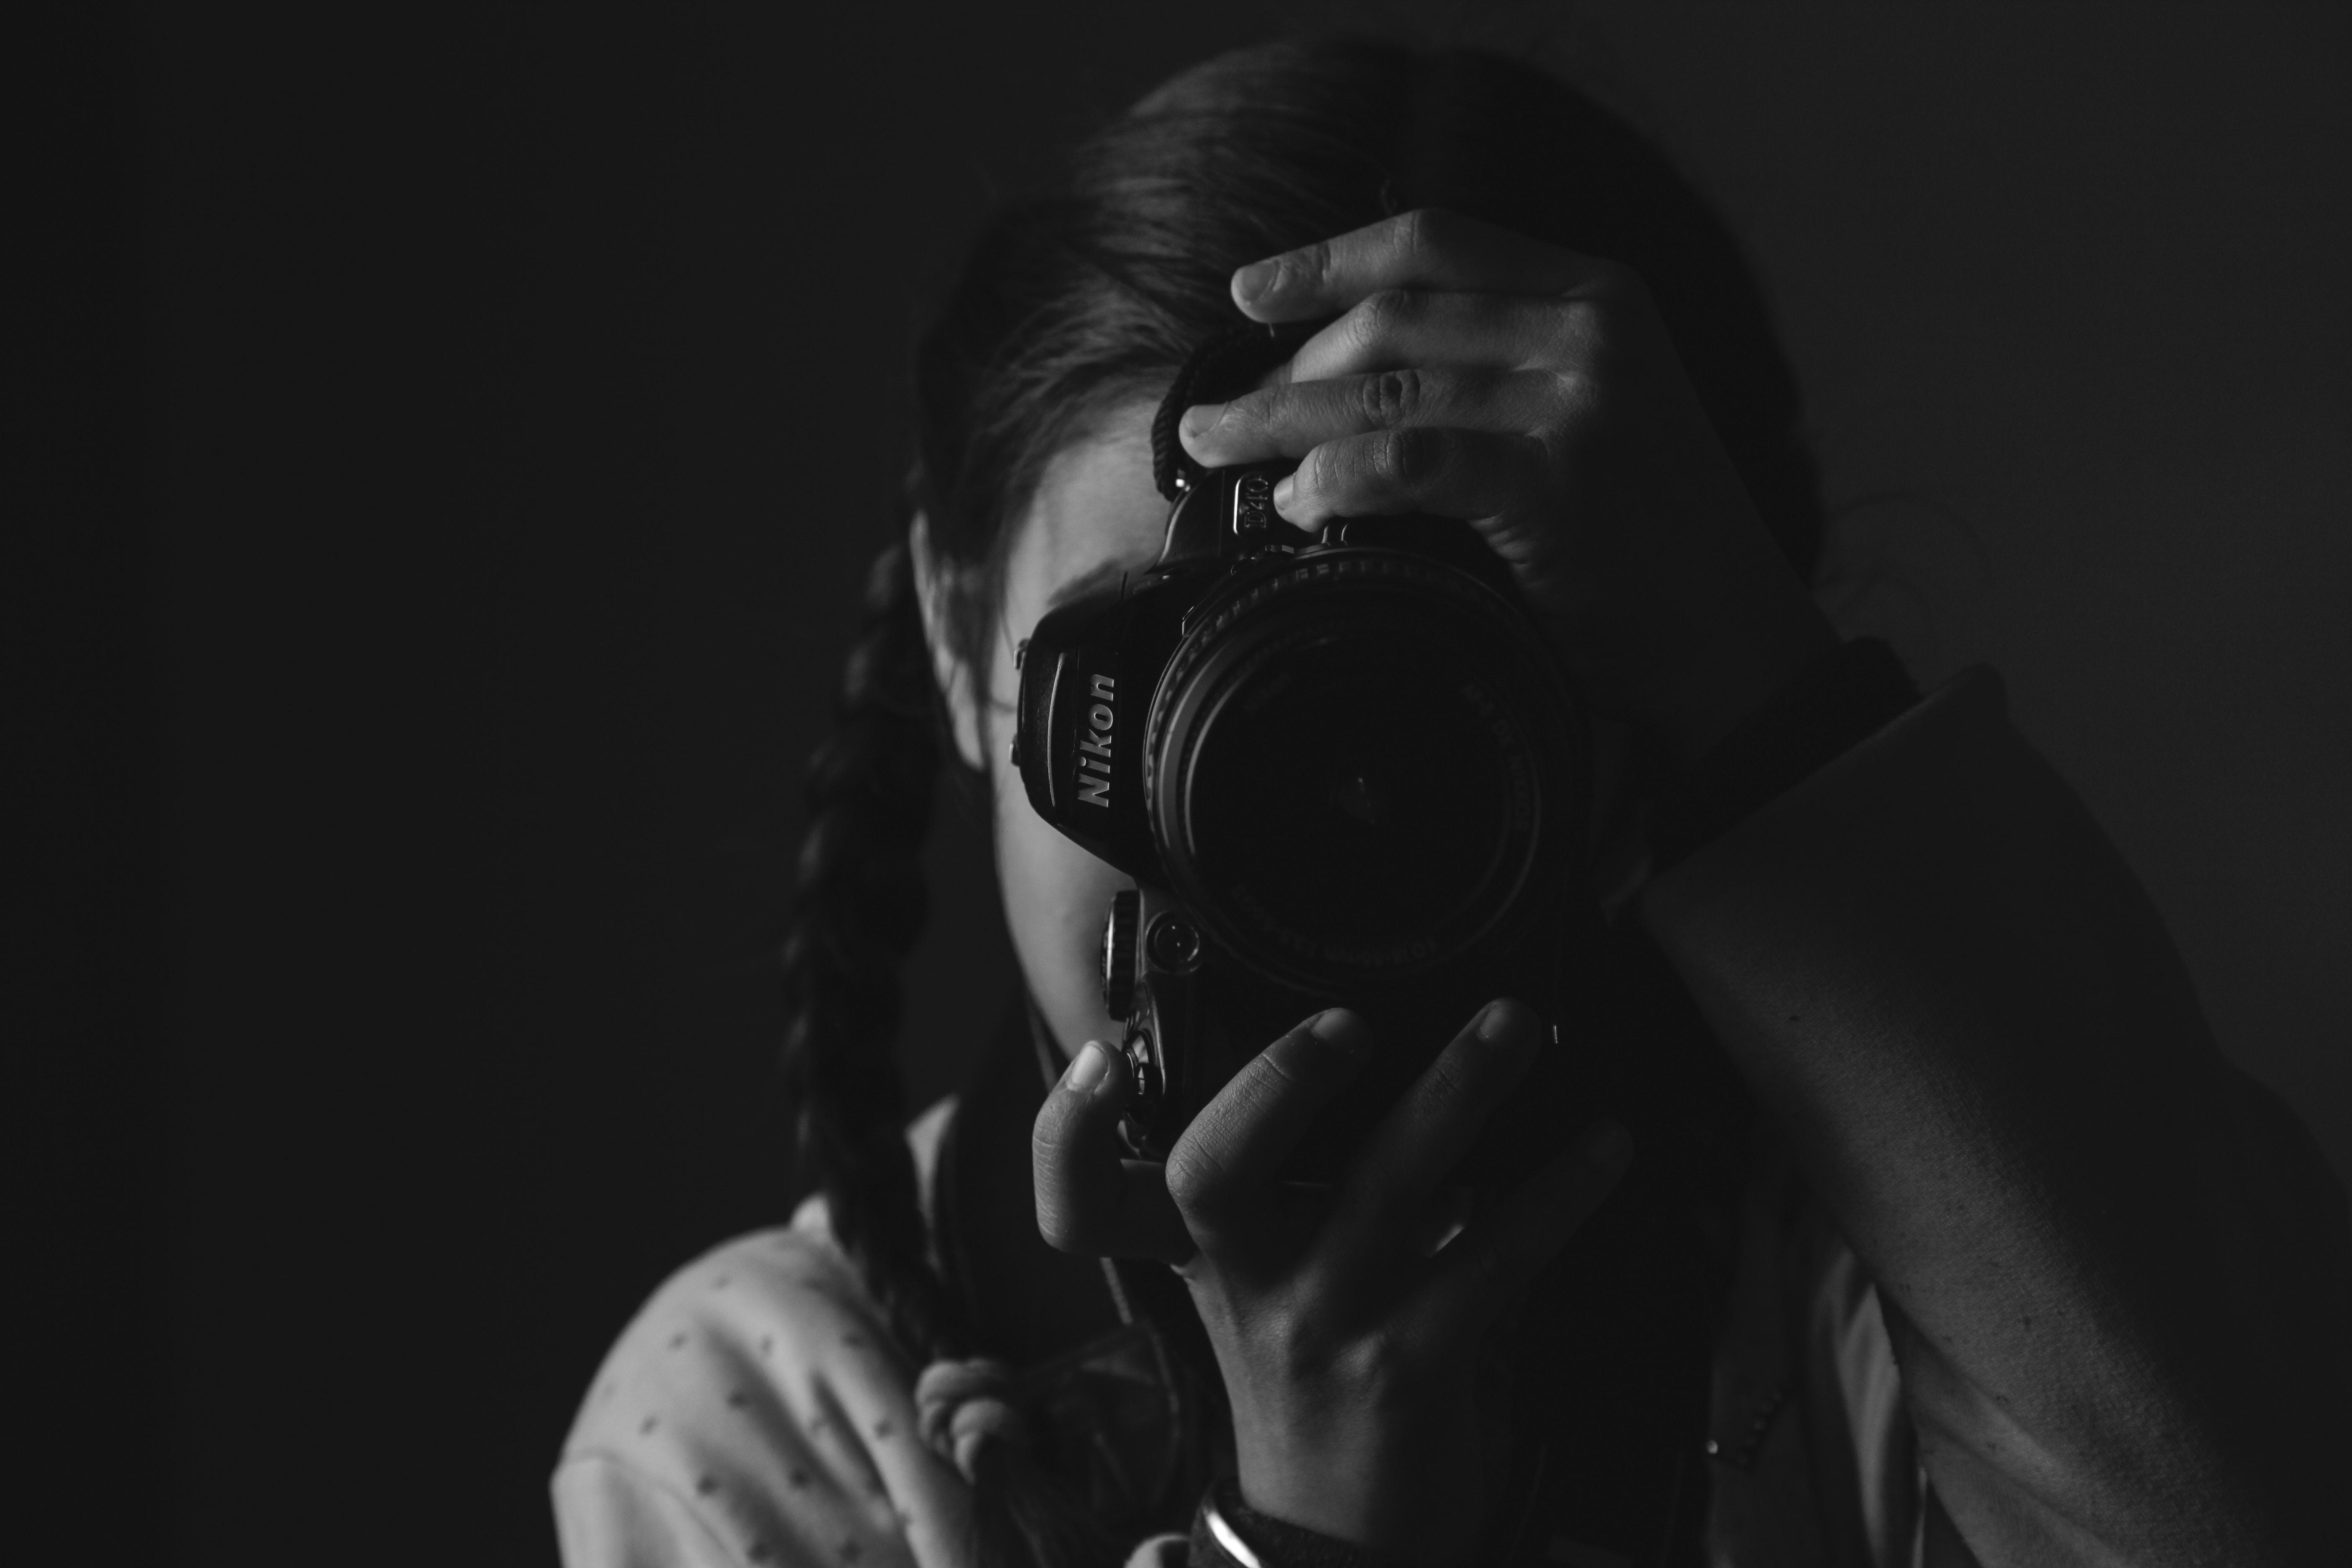 girl taking photo using Nikon DSLR camera in grayscale photography